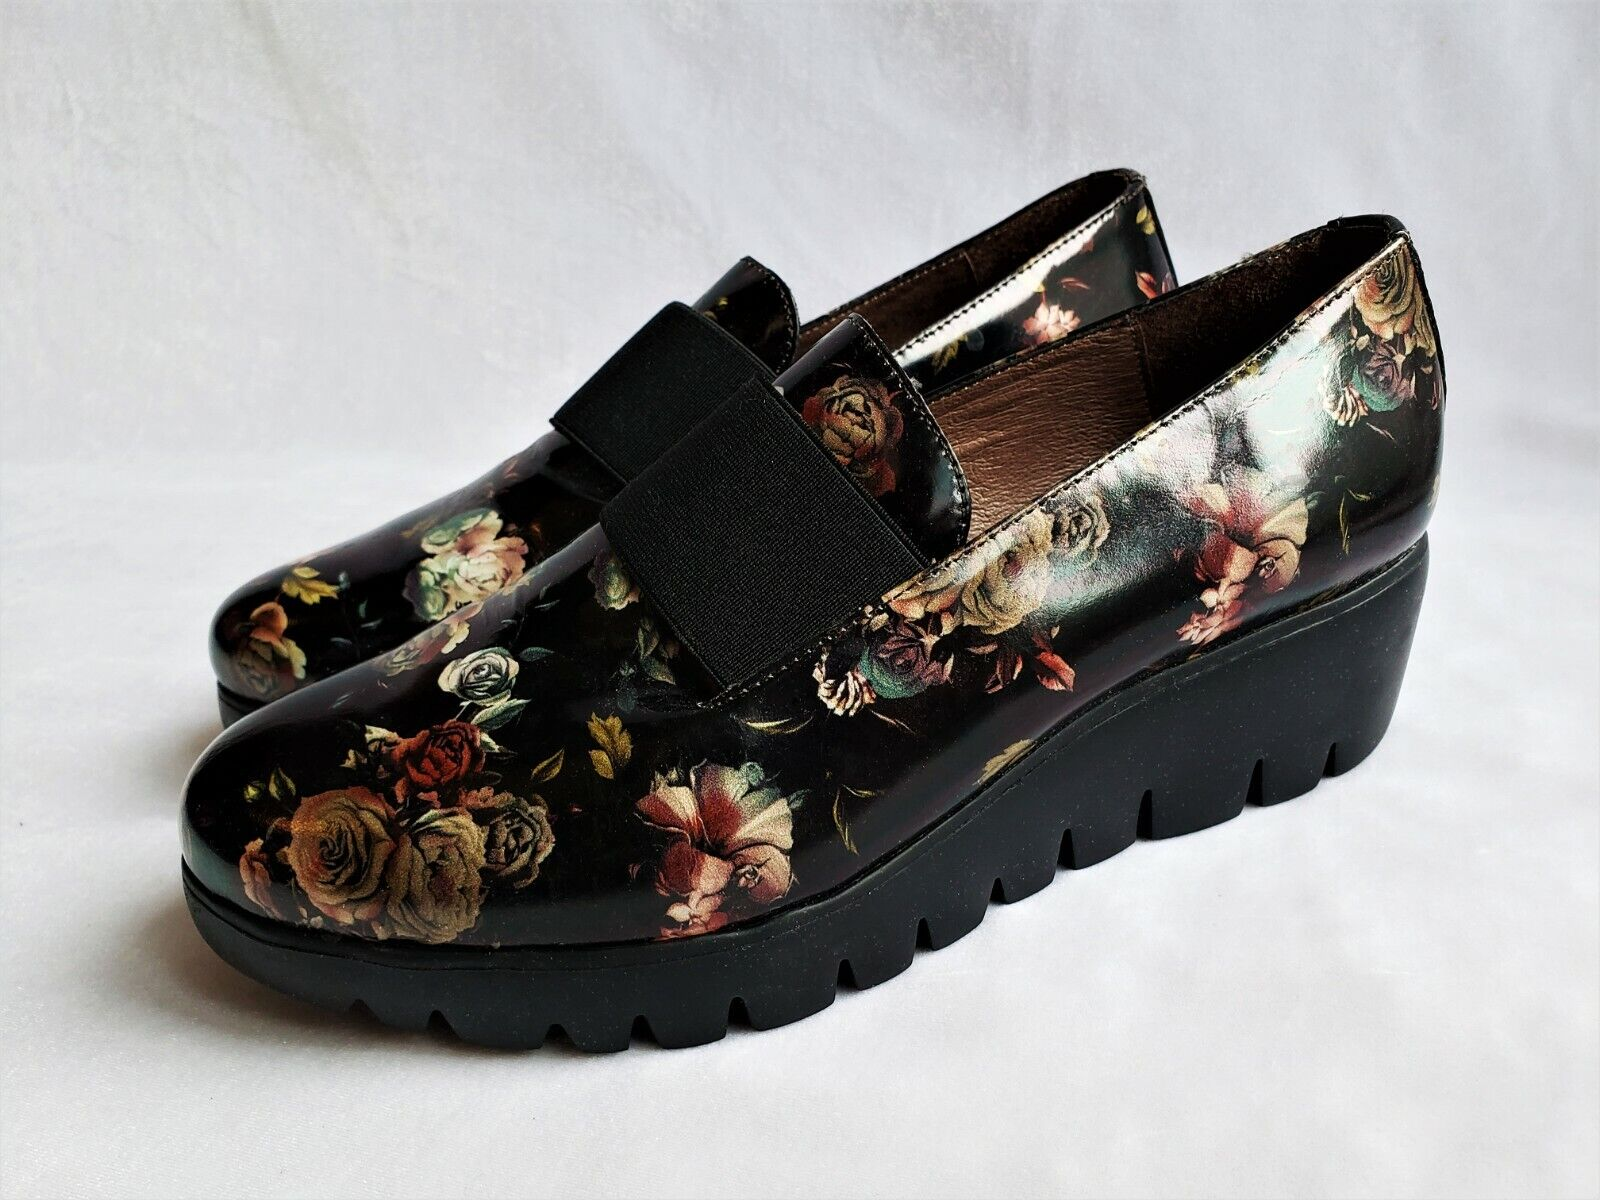 Wonders Women's Shoes Size 7/37 Black Floral Wedge Moccasin Loafer Comfort Spain